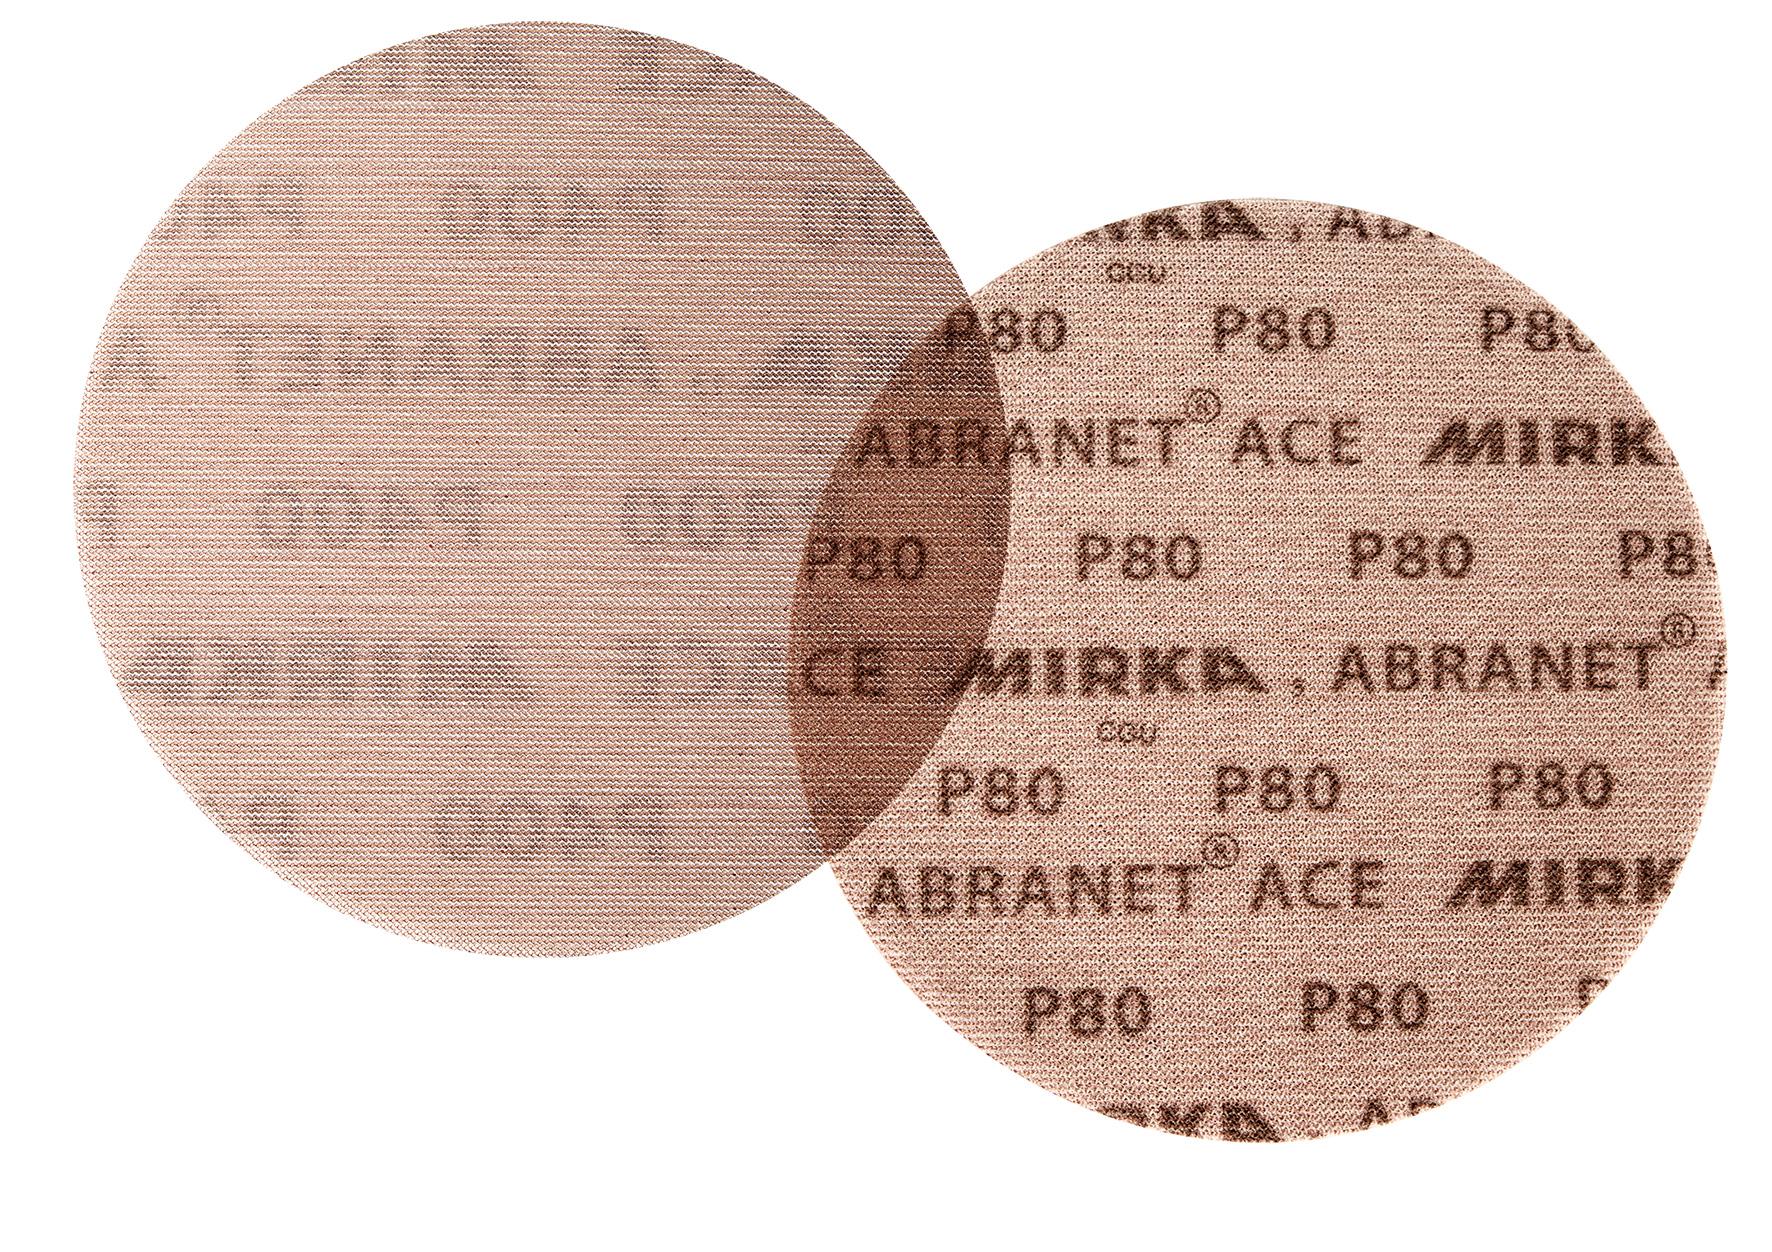 Mirka Abranet Gitternetz-Scheiben GRIP P80 Ø 77 mm 50 Stk.